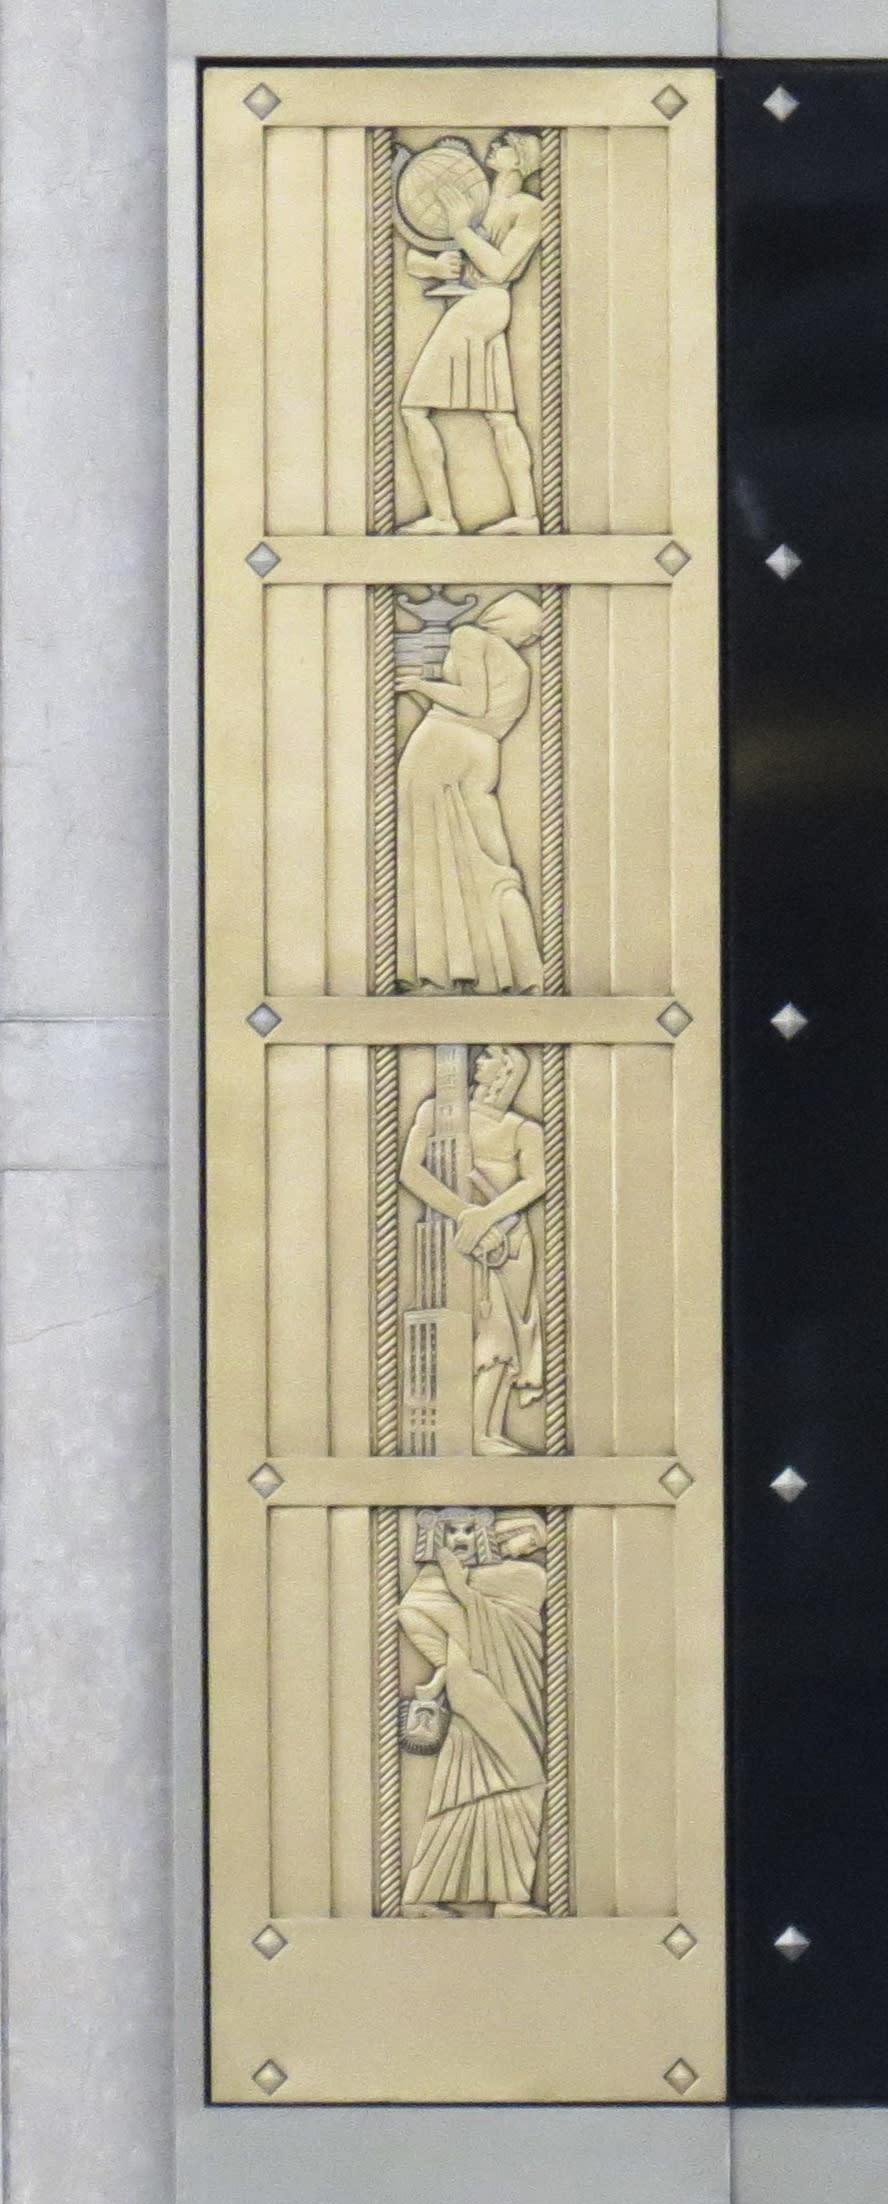 Public Sculptures by Lee Lawrie seen at 600 California, San Francisco - Elevator Doors Depicting Allegorical Figures